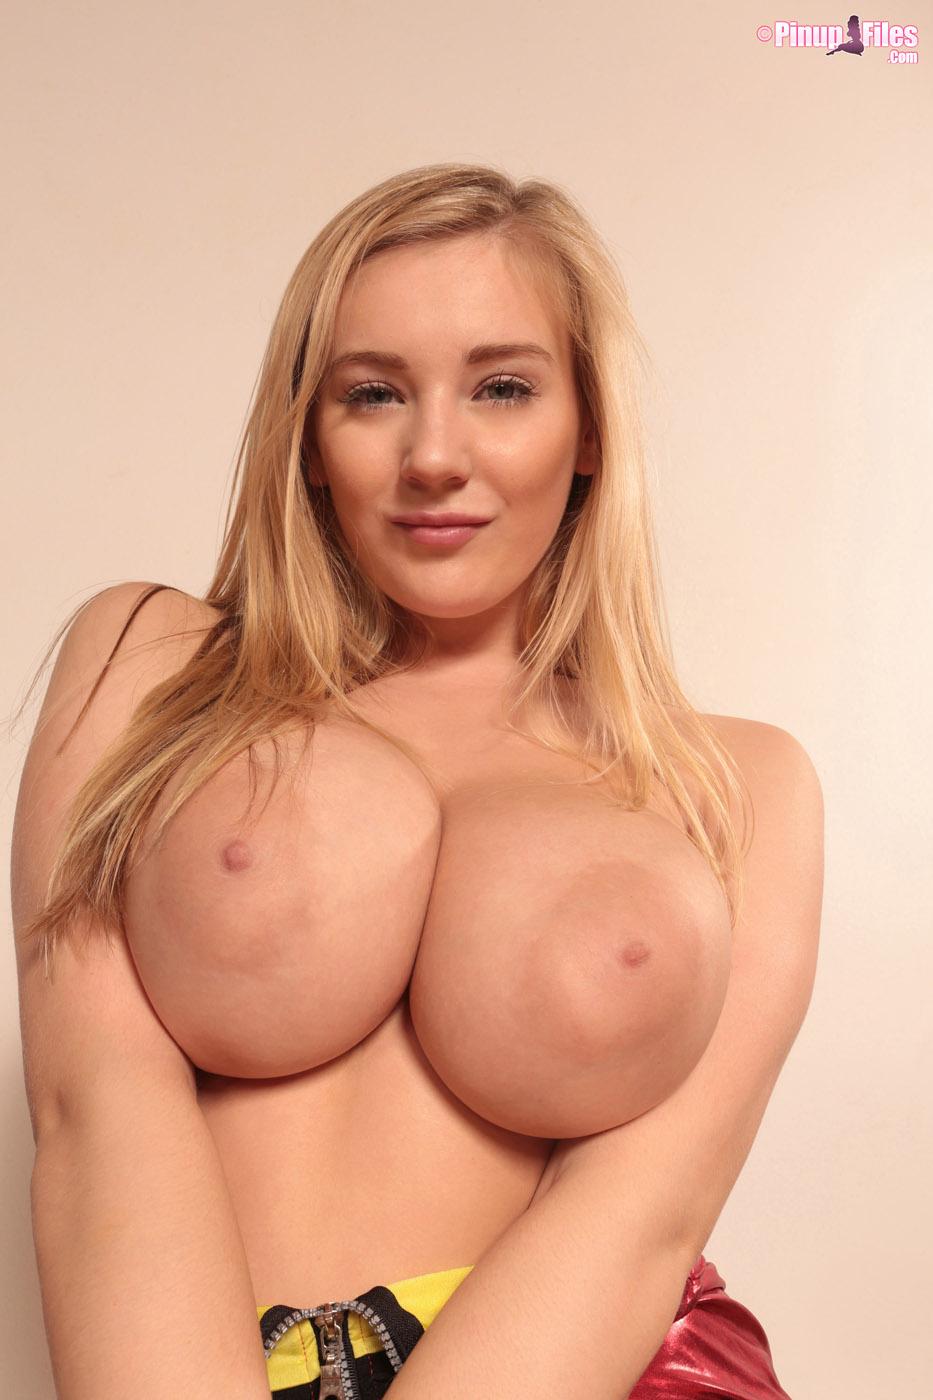 Tinkerbell free nude pics